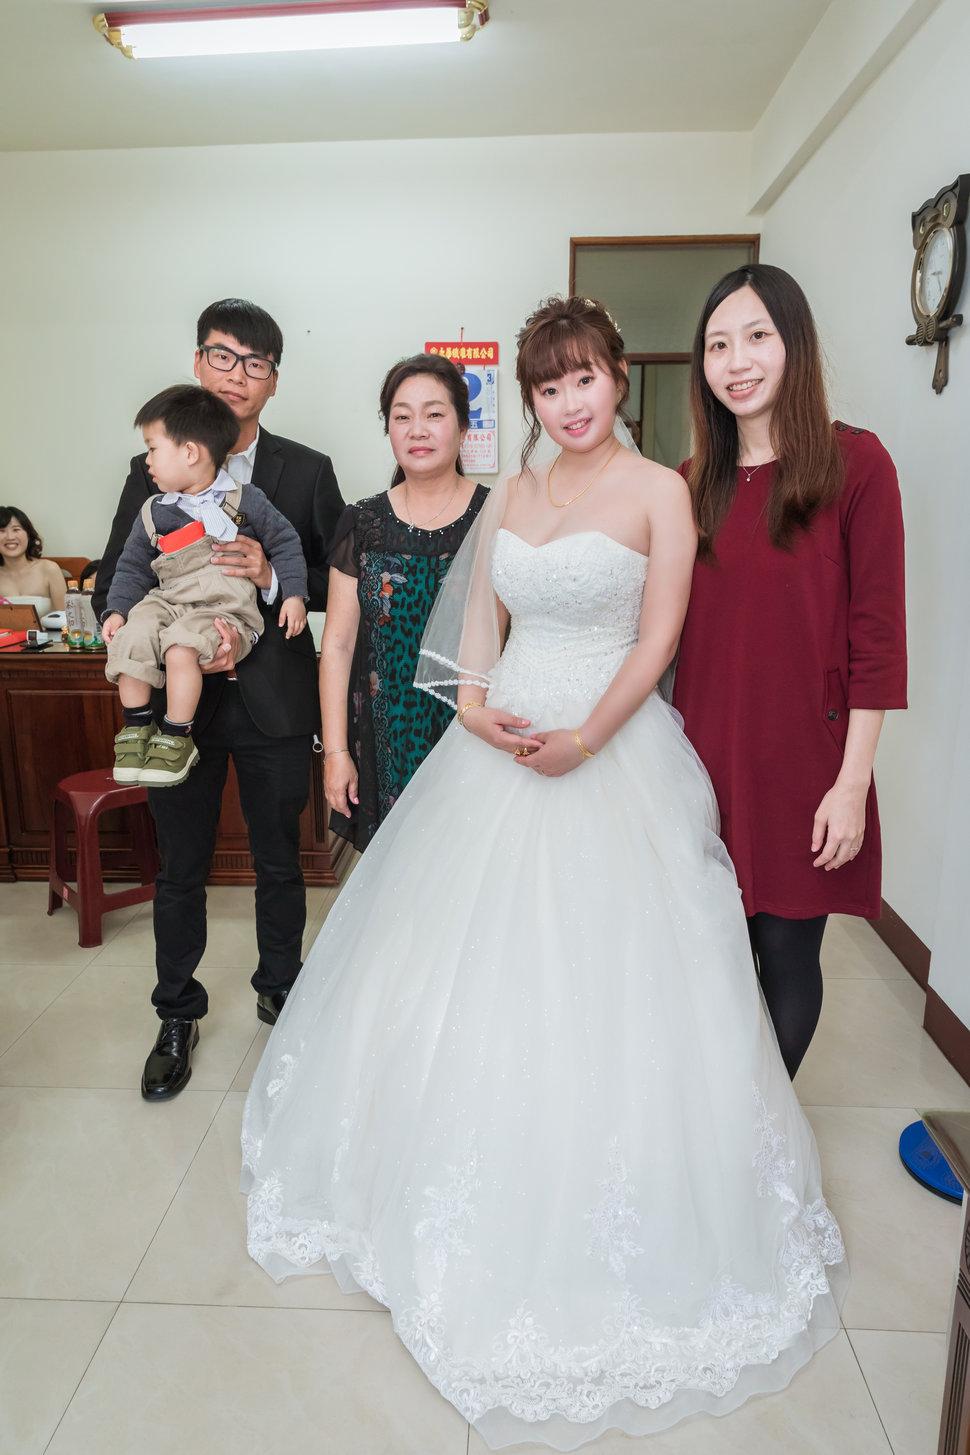 5D4_1835 - Promaker婚禮紀錄攝影團隊婚攝豪哥《結婚吧》